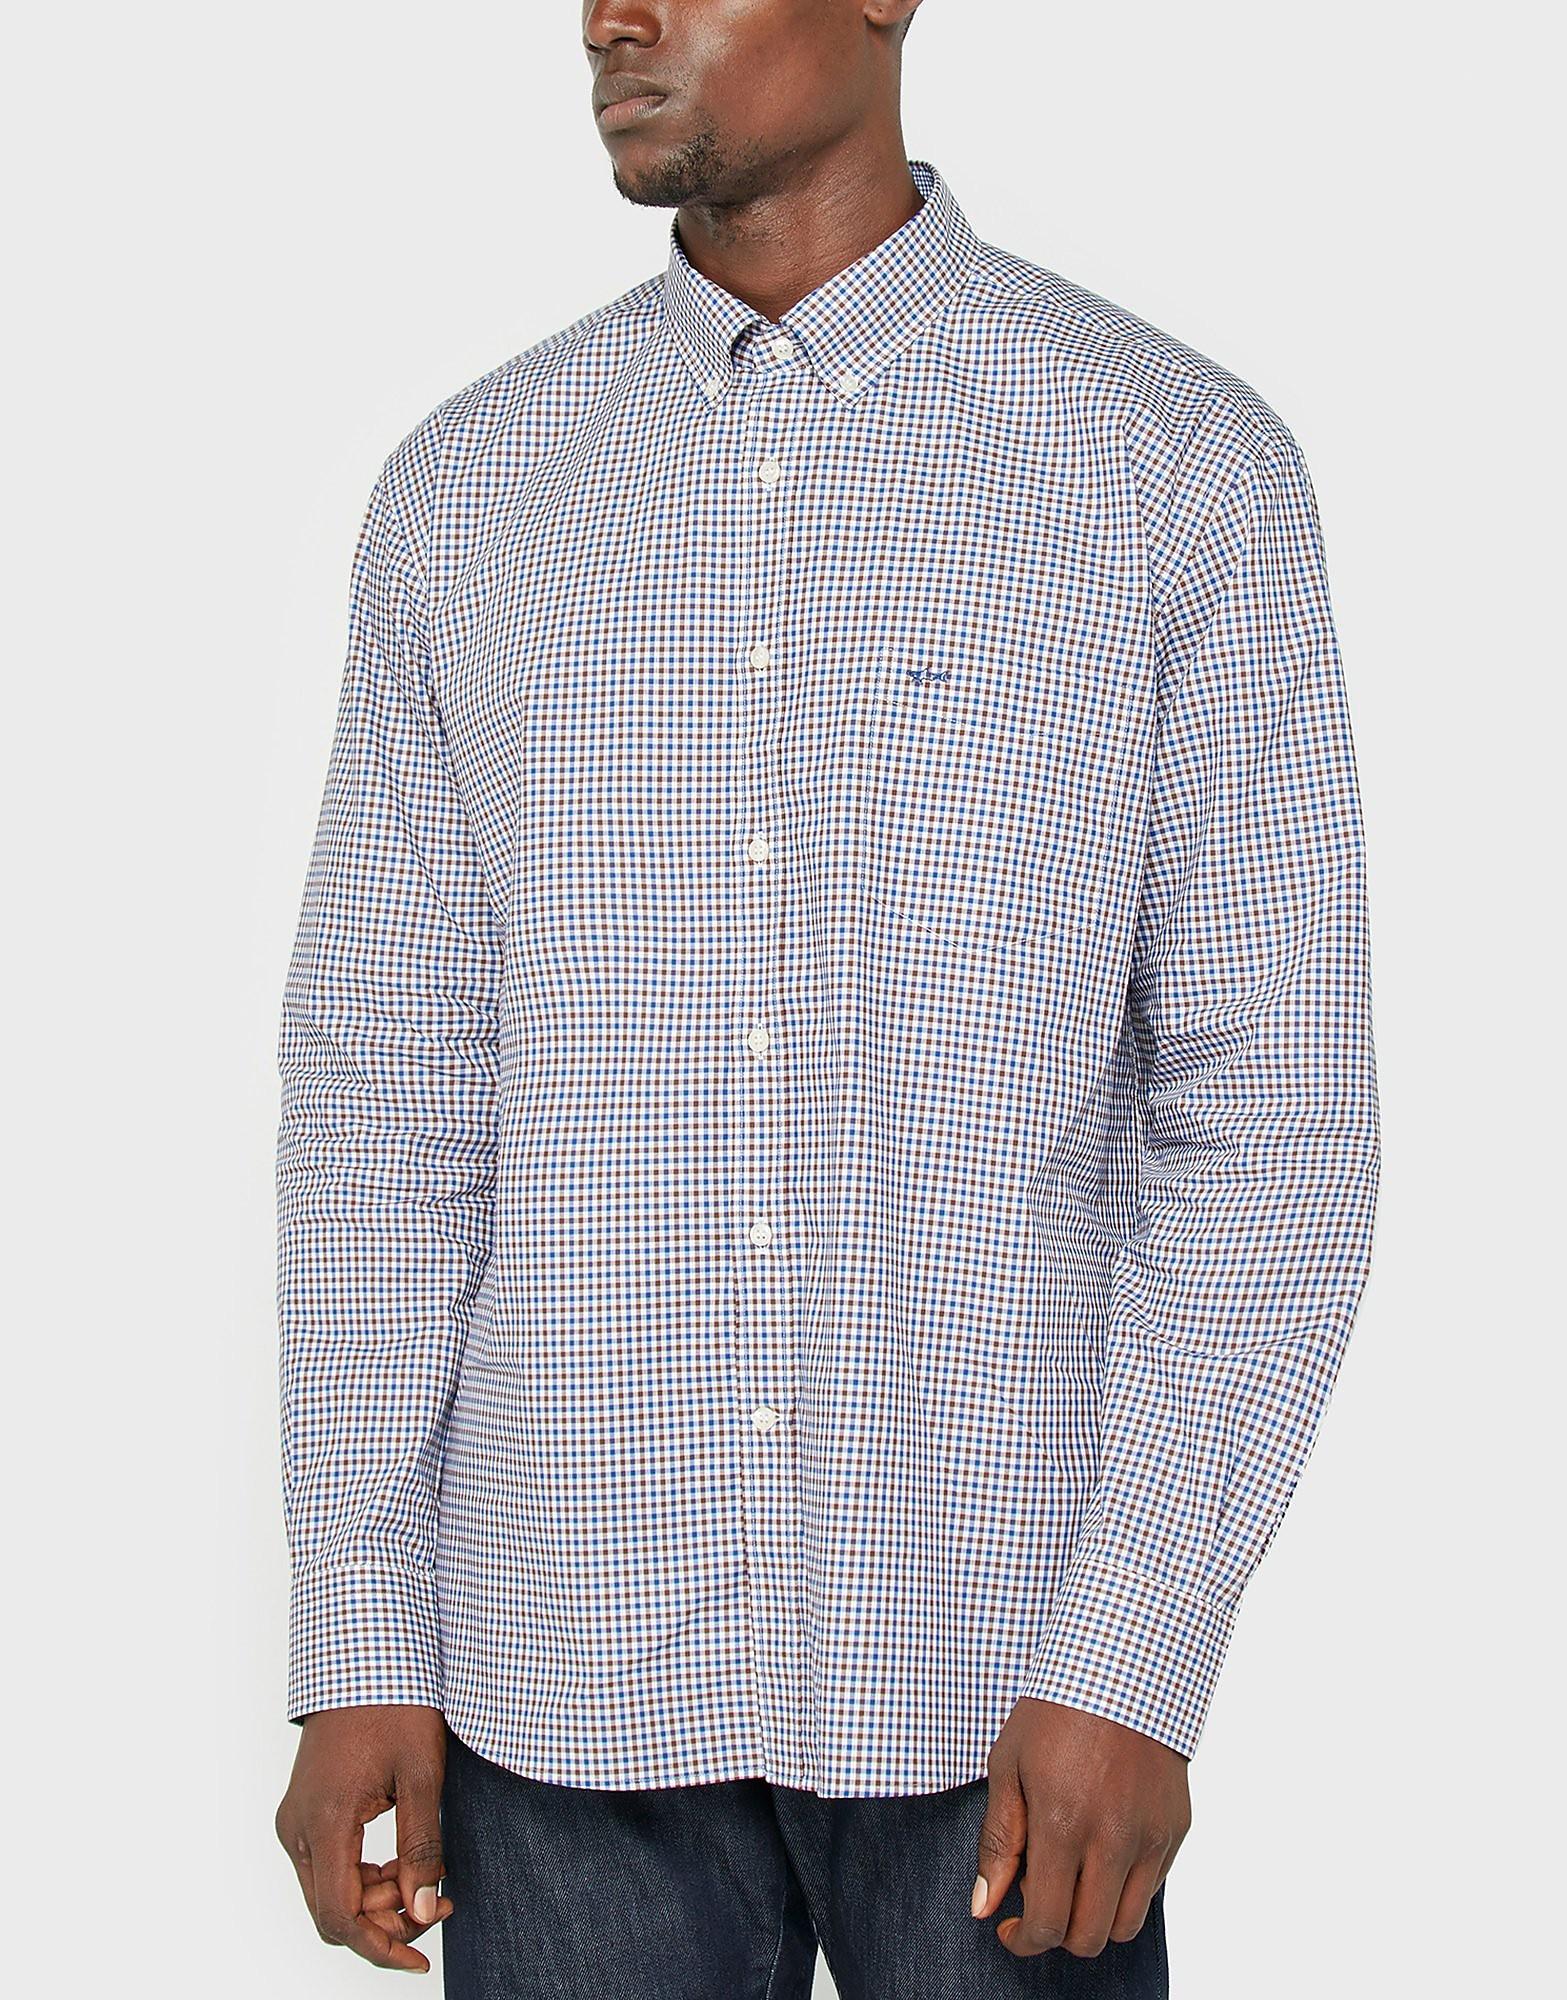 Paul and Shark Gingham Shirt